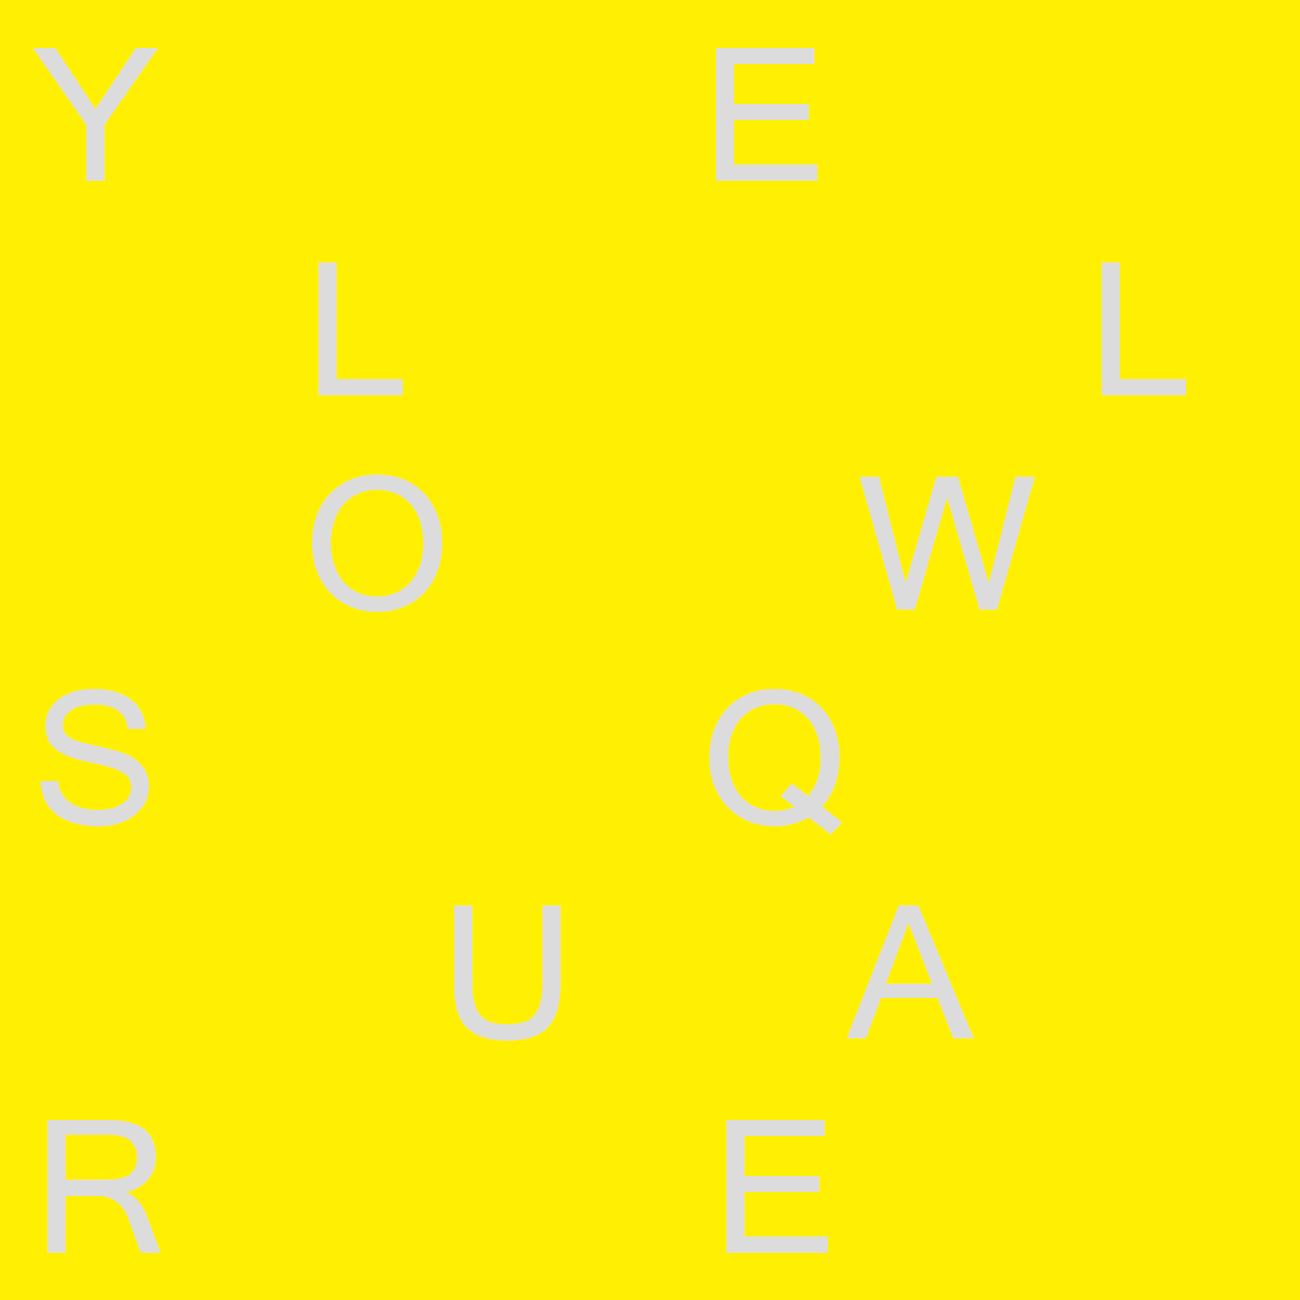 #YELLOWSQUARE